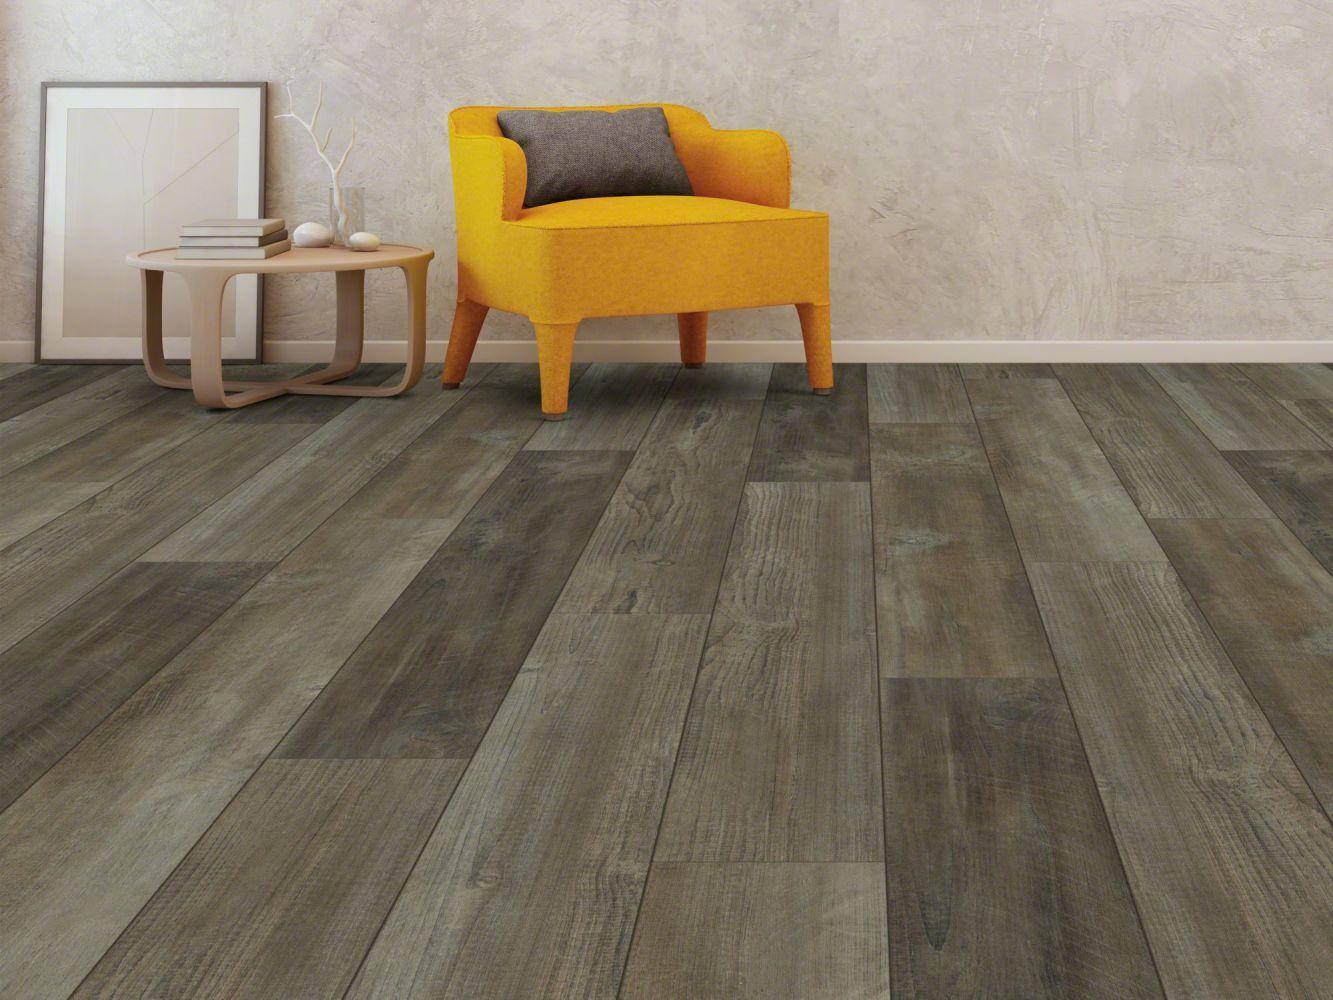 Shaw Floors Resilient Residential Cross-sawn Pine 720g Plus Antique Pine 05006_0869V